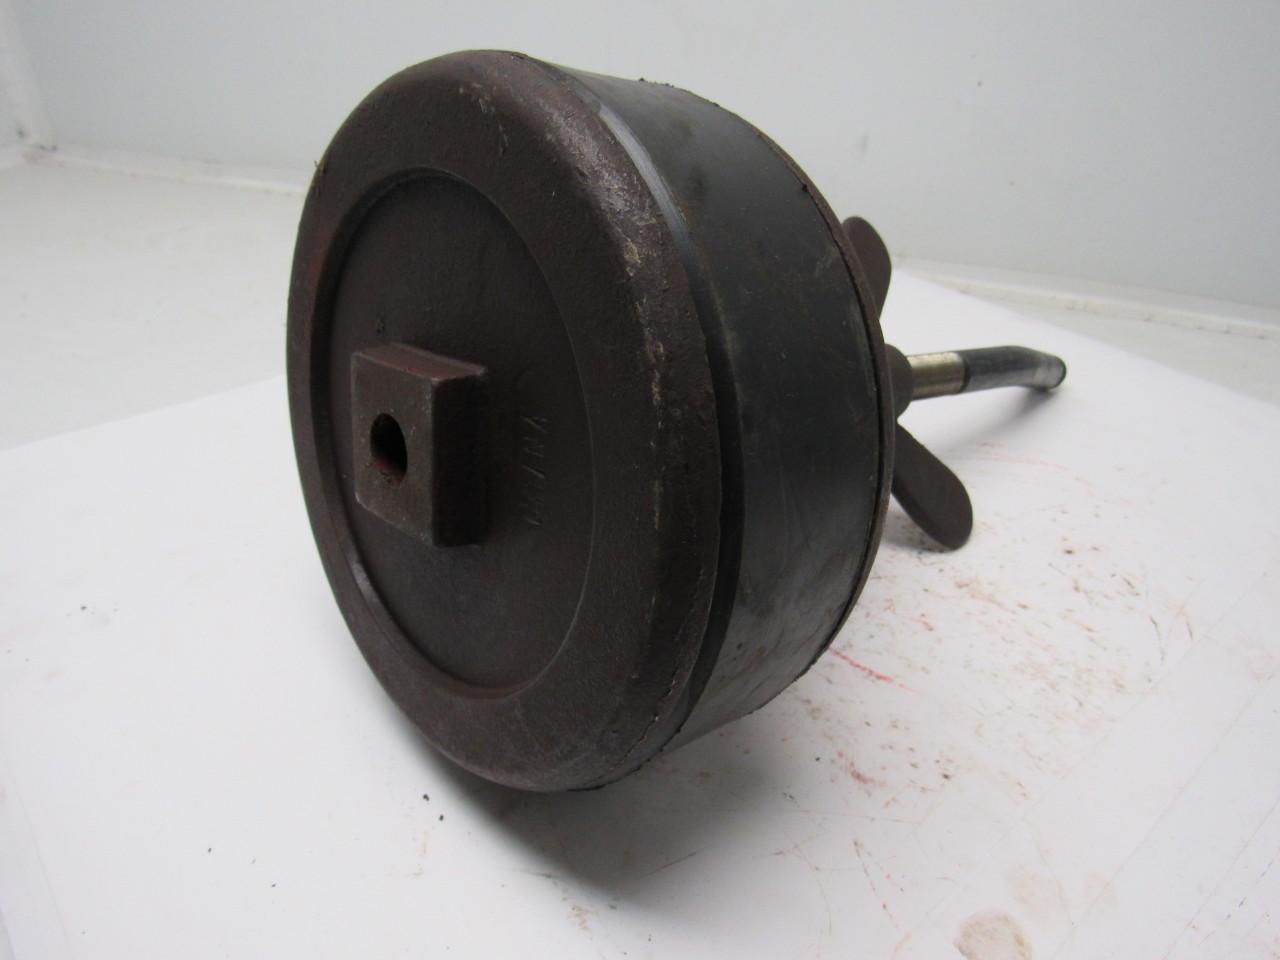 Proflo pf cast iron test plug w wingnut fits quot pipe